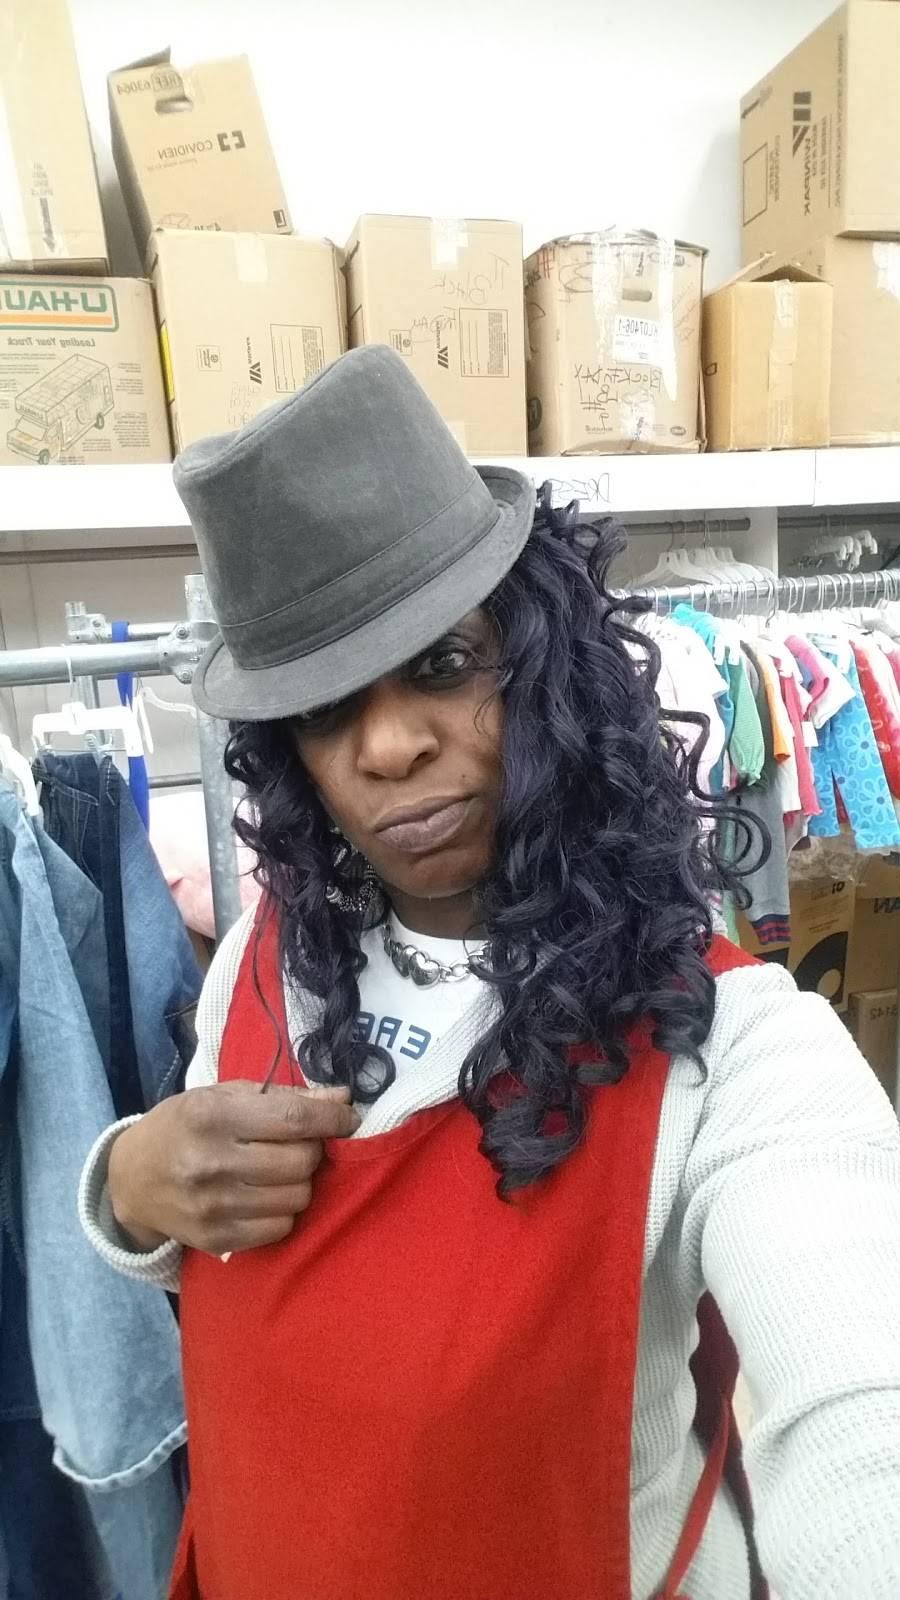 Value World - clothing store  | Photo 6 of 7 | Address: 2001 E Eleven Mile Rd, Warren, MI 48092, USA | Phone: (734) 728-4610